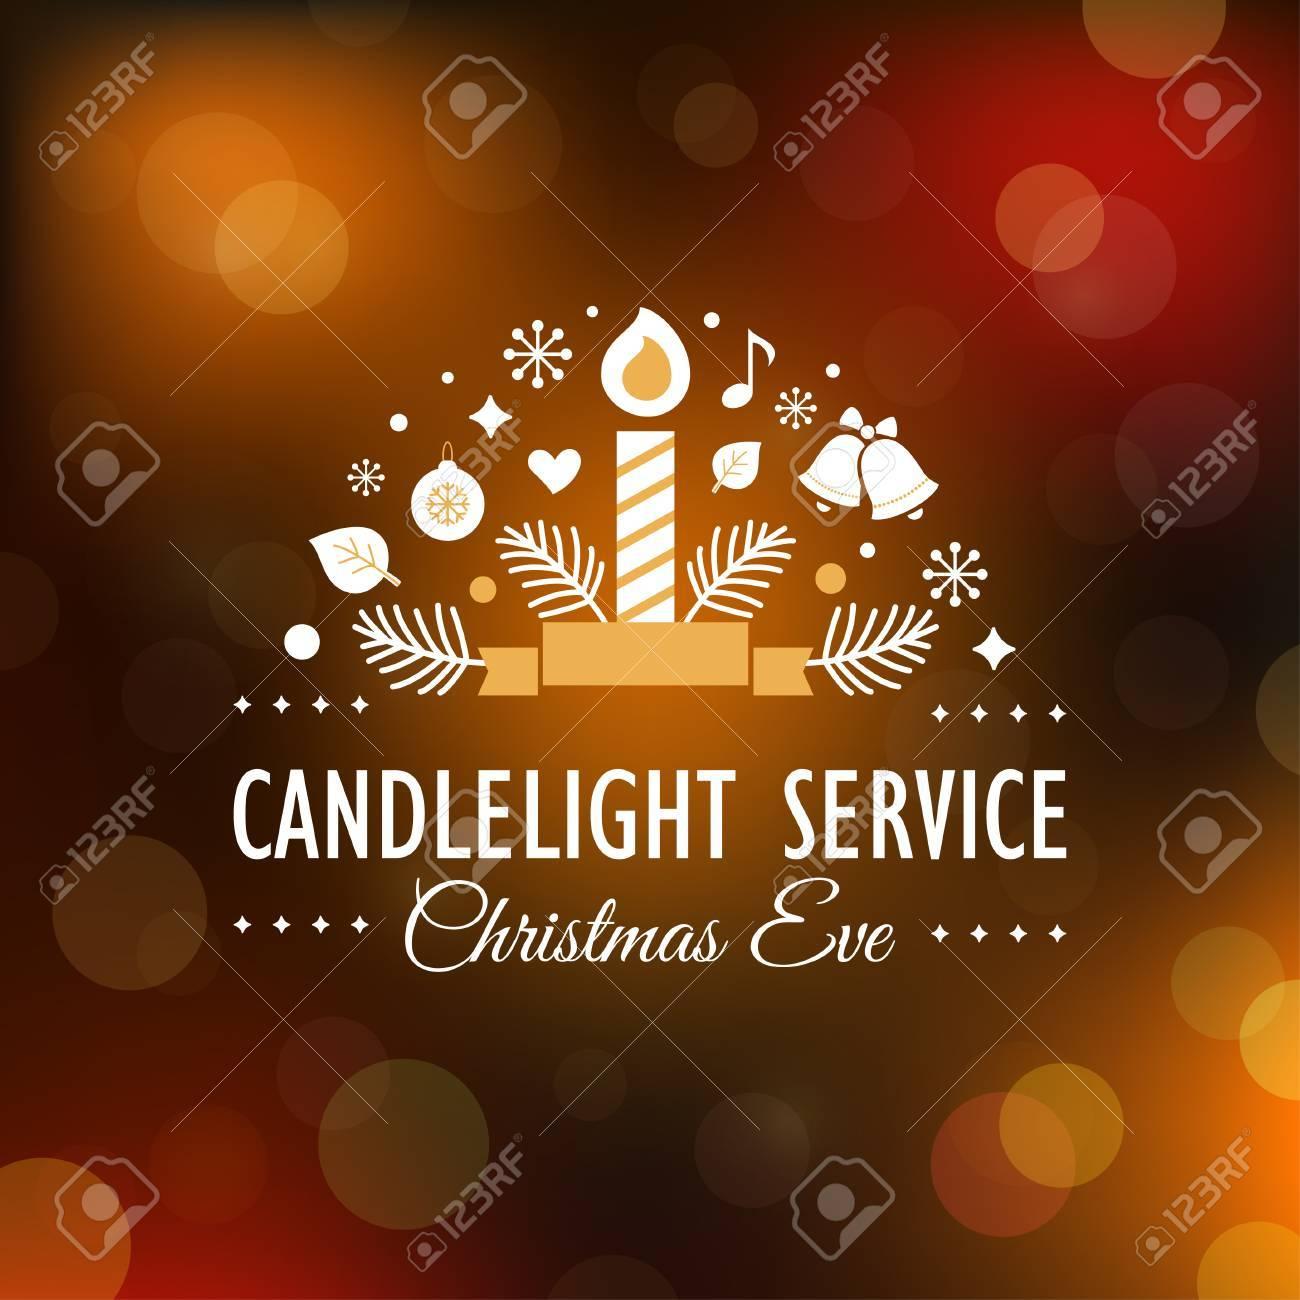 Christmas Eve Candlelight Service Invitation. Blurry Background - 59989143